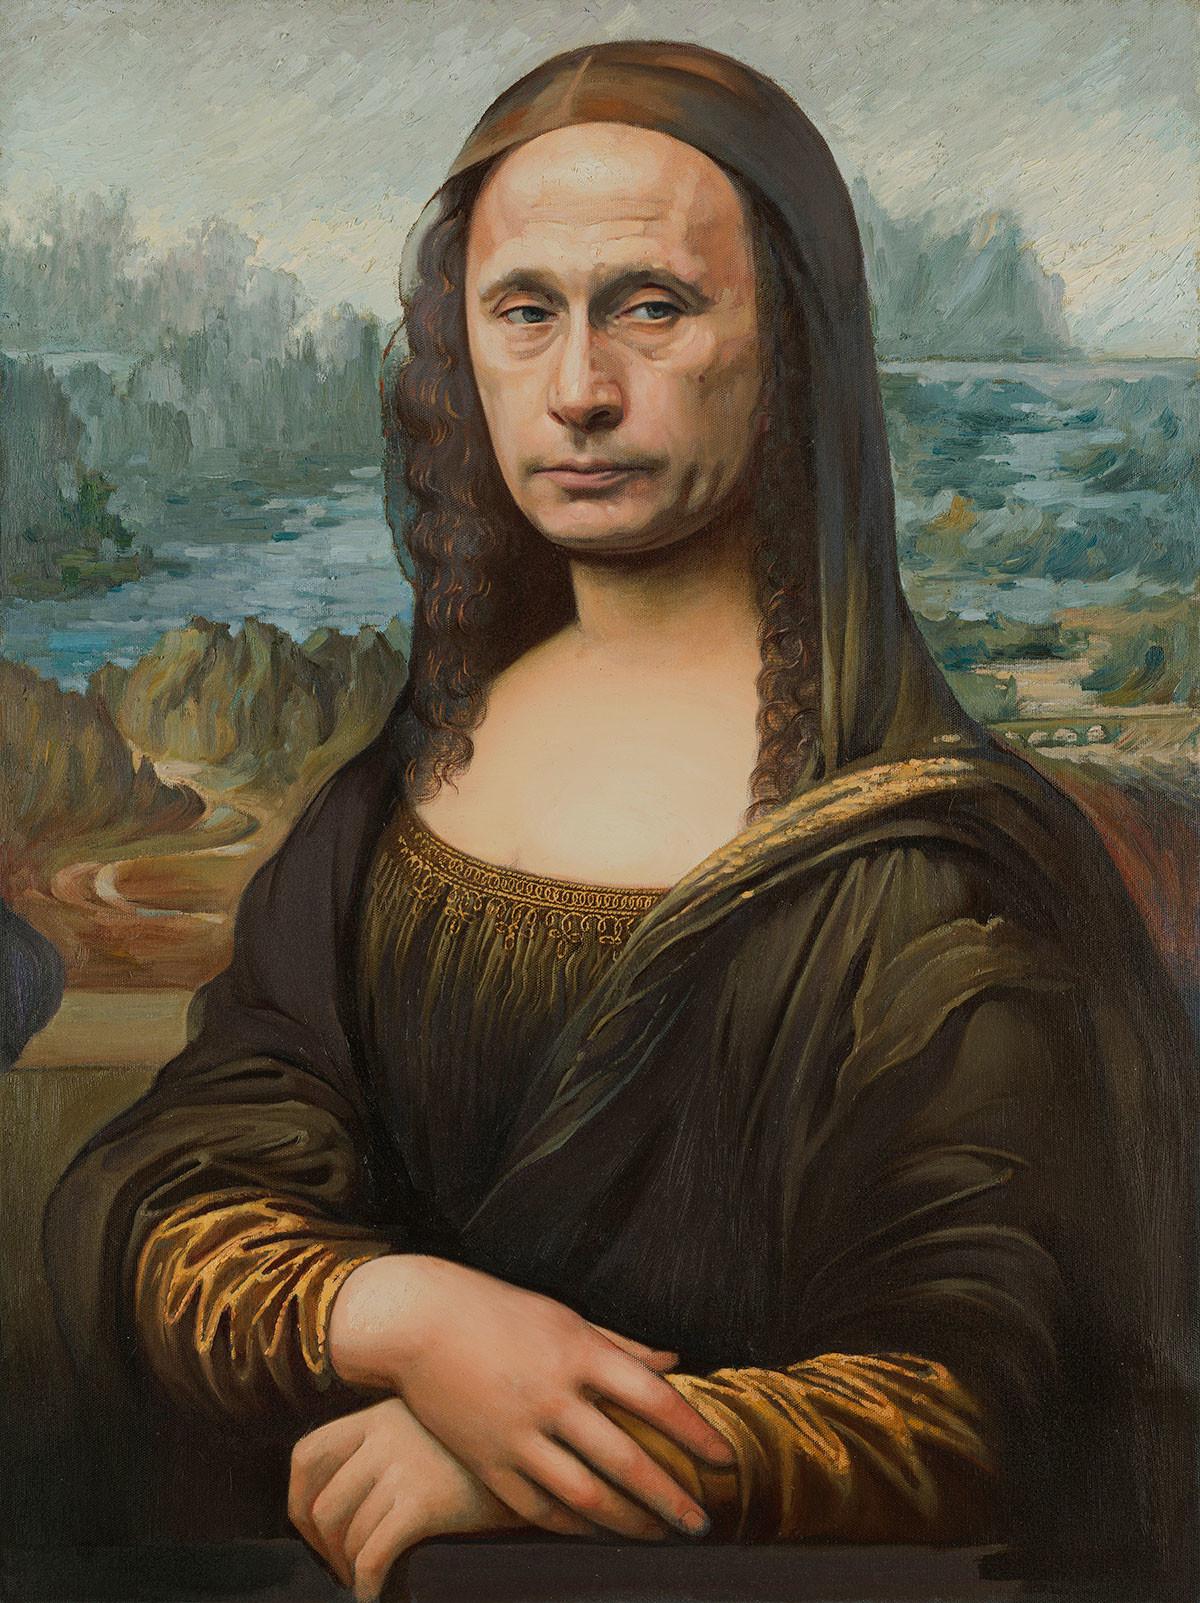 Aleksandr Kosolapov. Mona Lisa, 2020